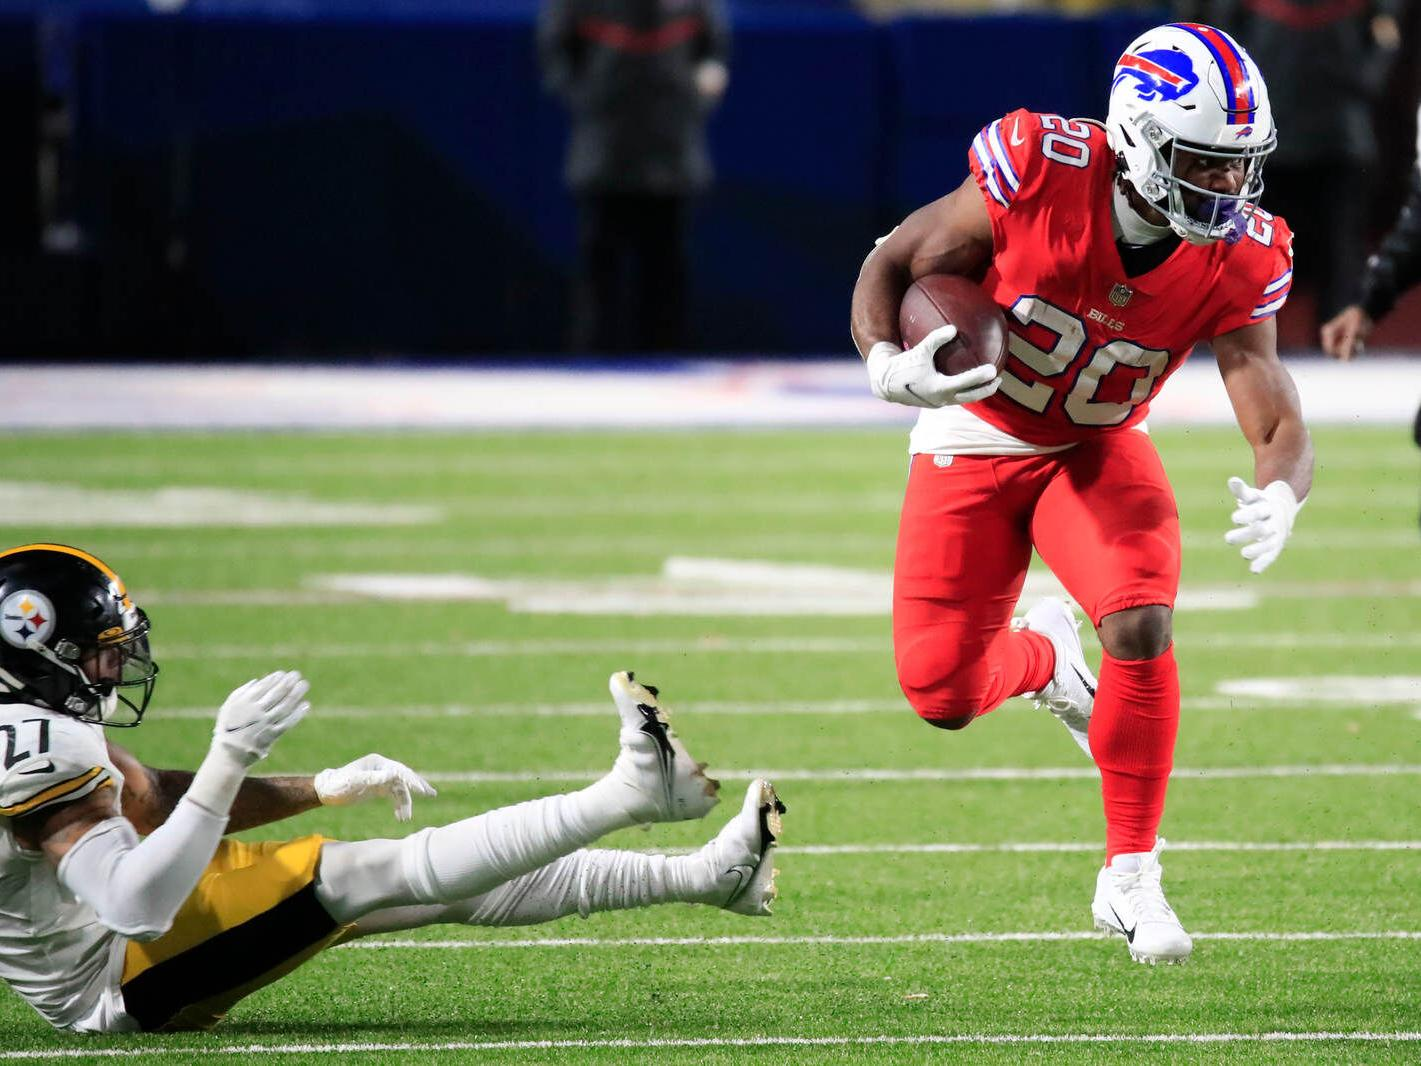 How The Bills Ran 7 Minutes 11 Seconds Off The Clock To Beat Pittsburgh Buffalo Bills News Nfl Buffalonews Com